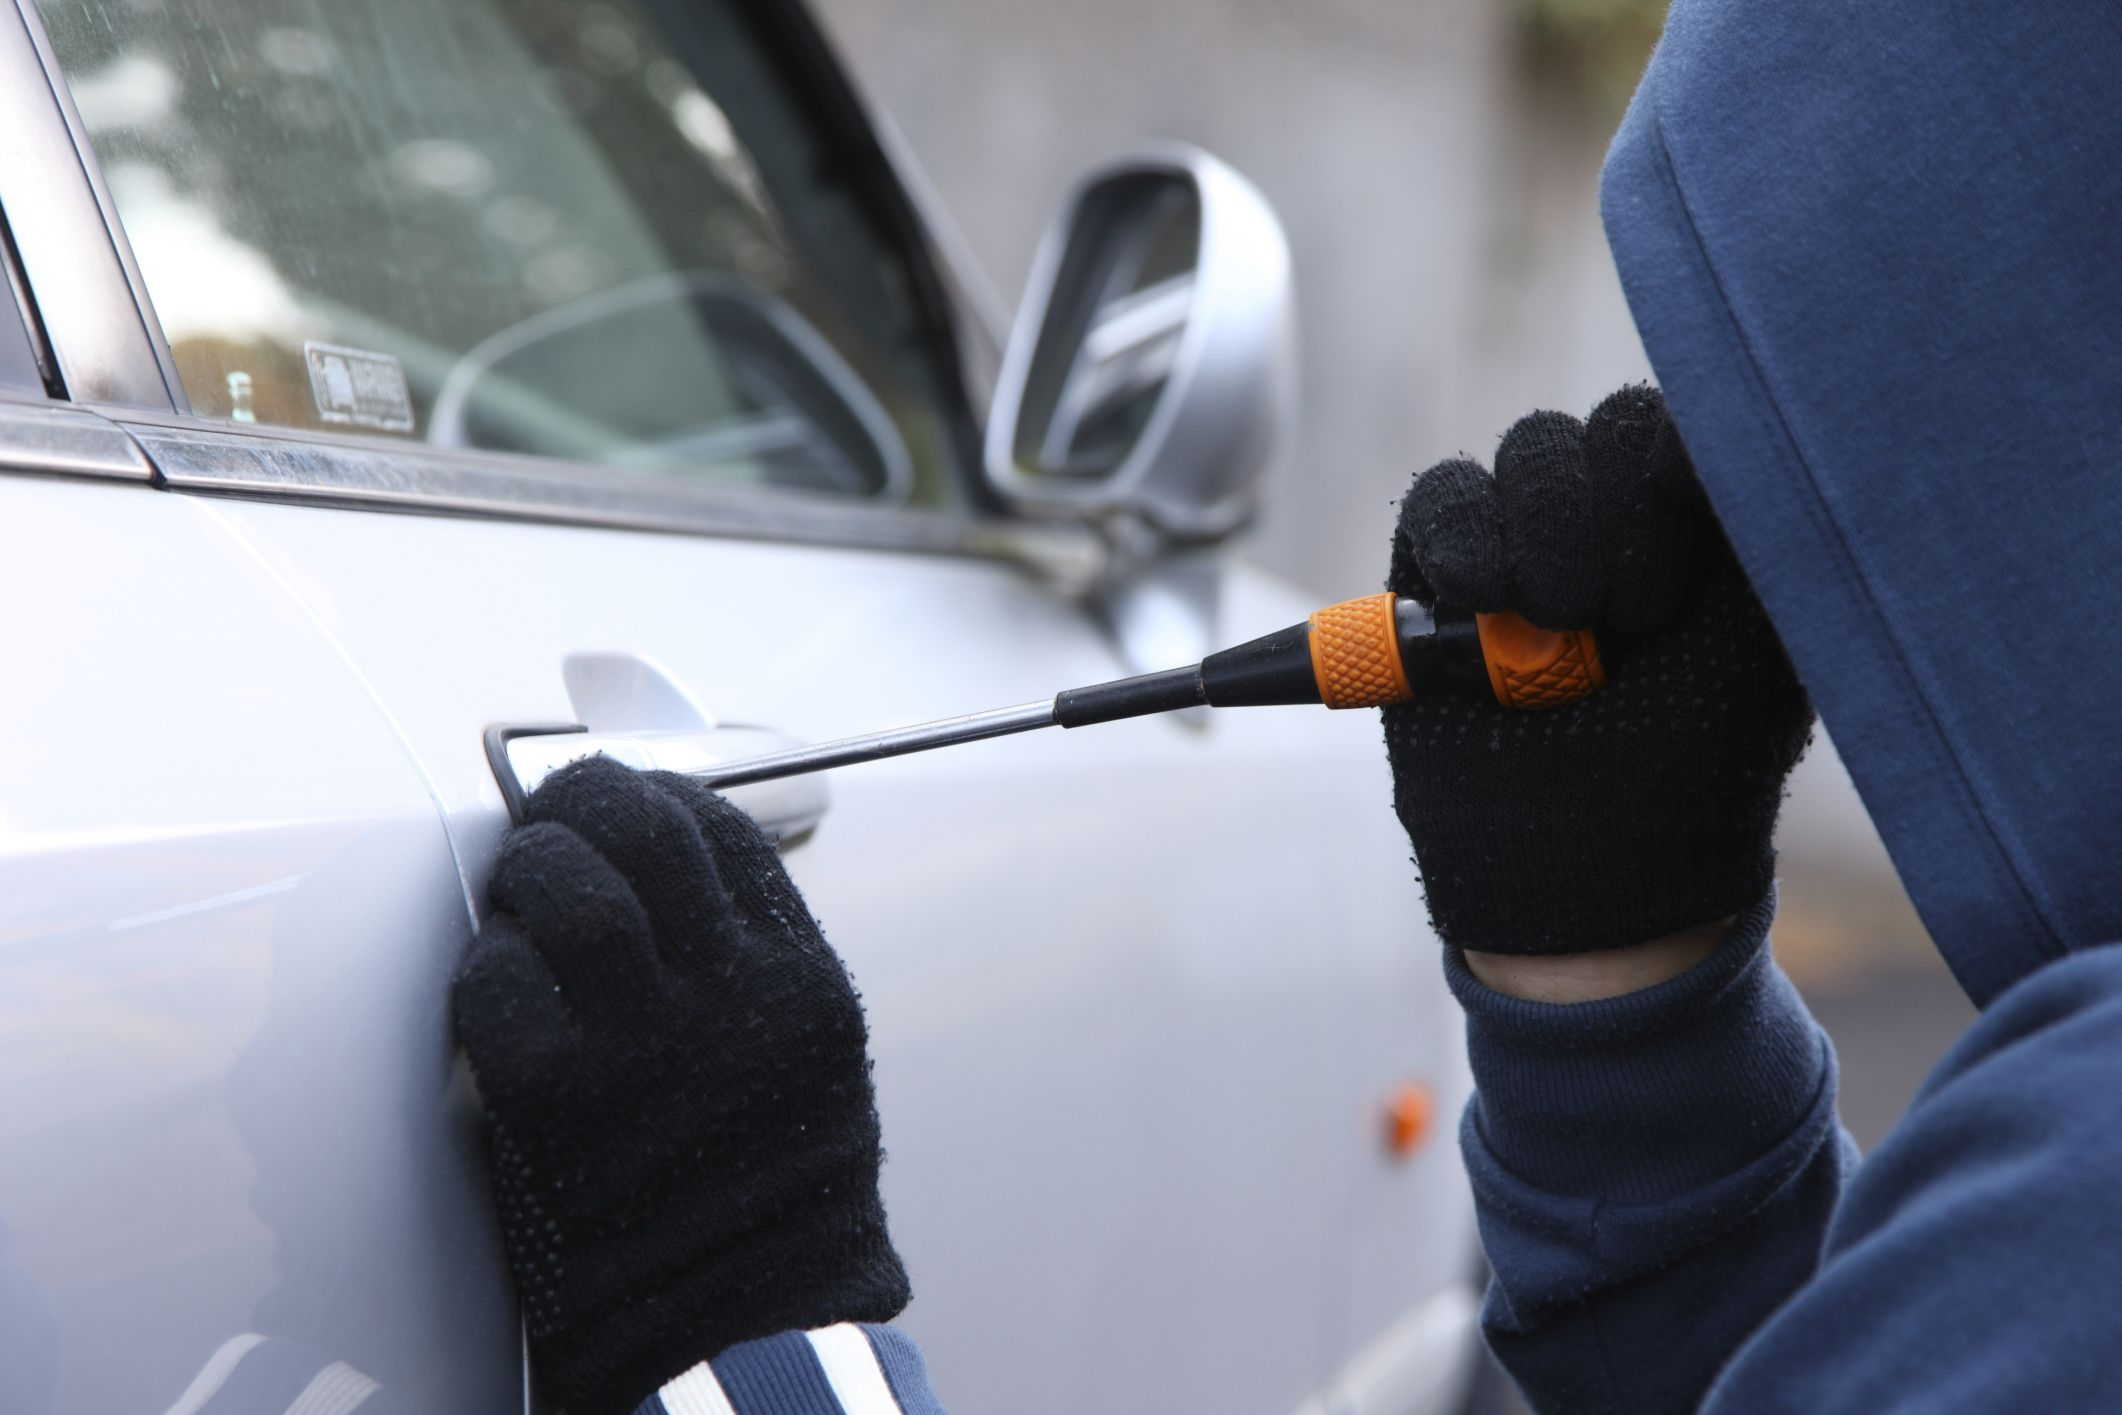 سامانه اعلام سرقت خودرو اینترنتی